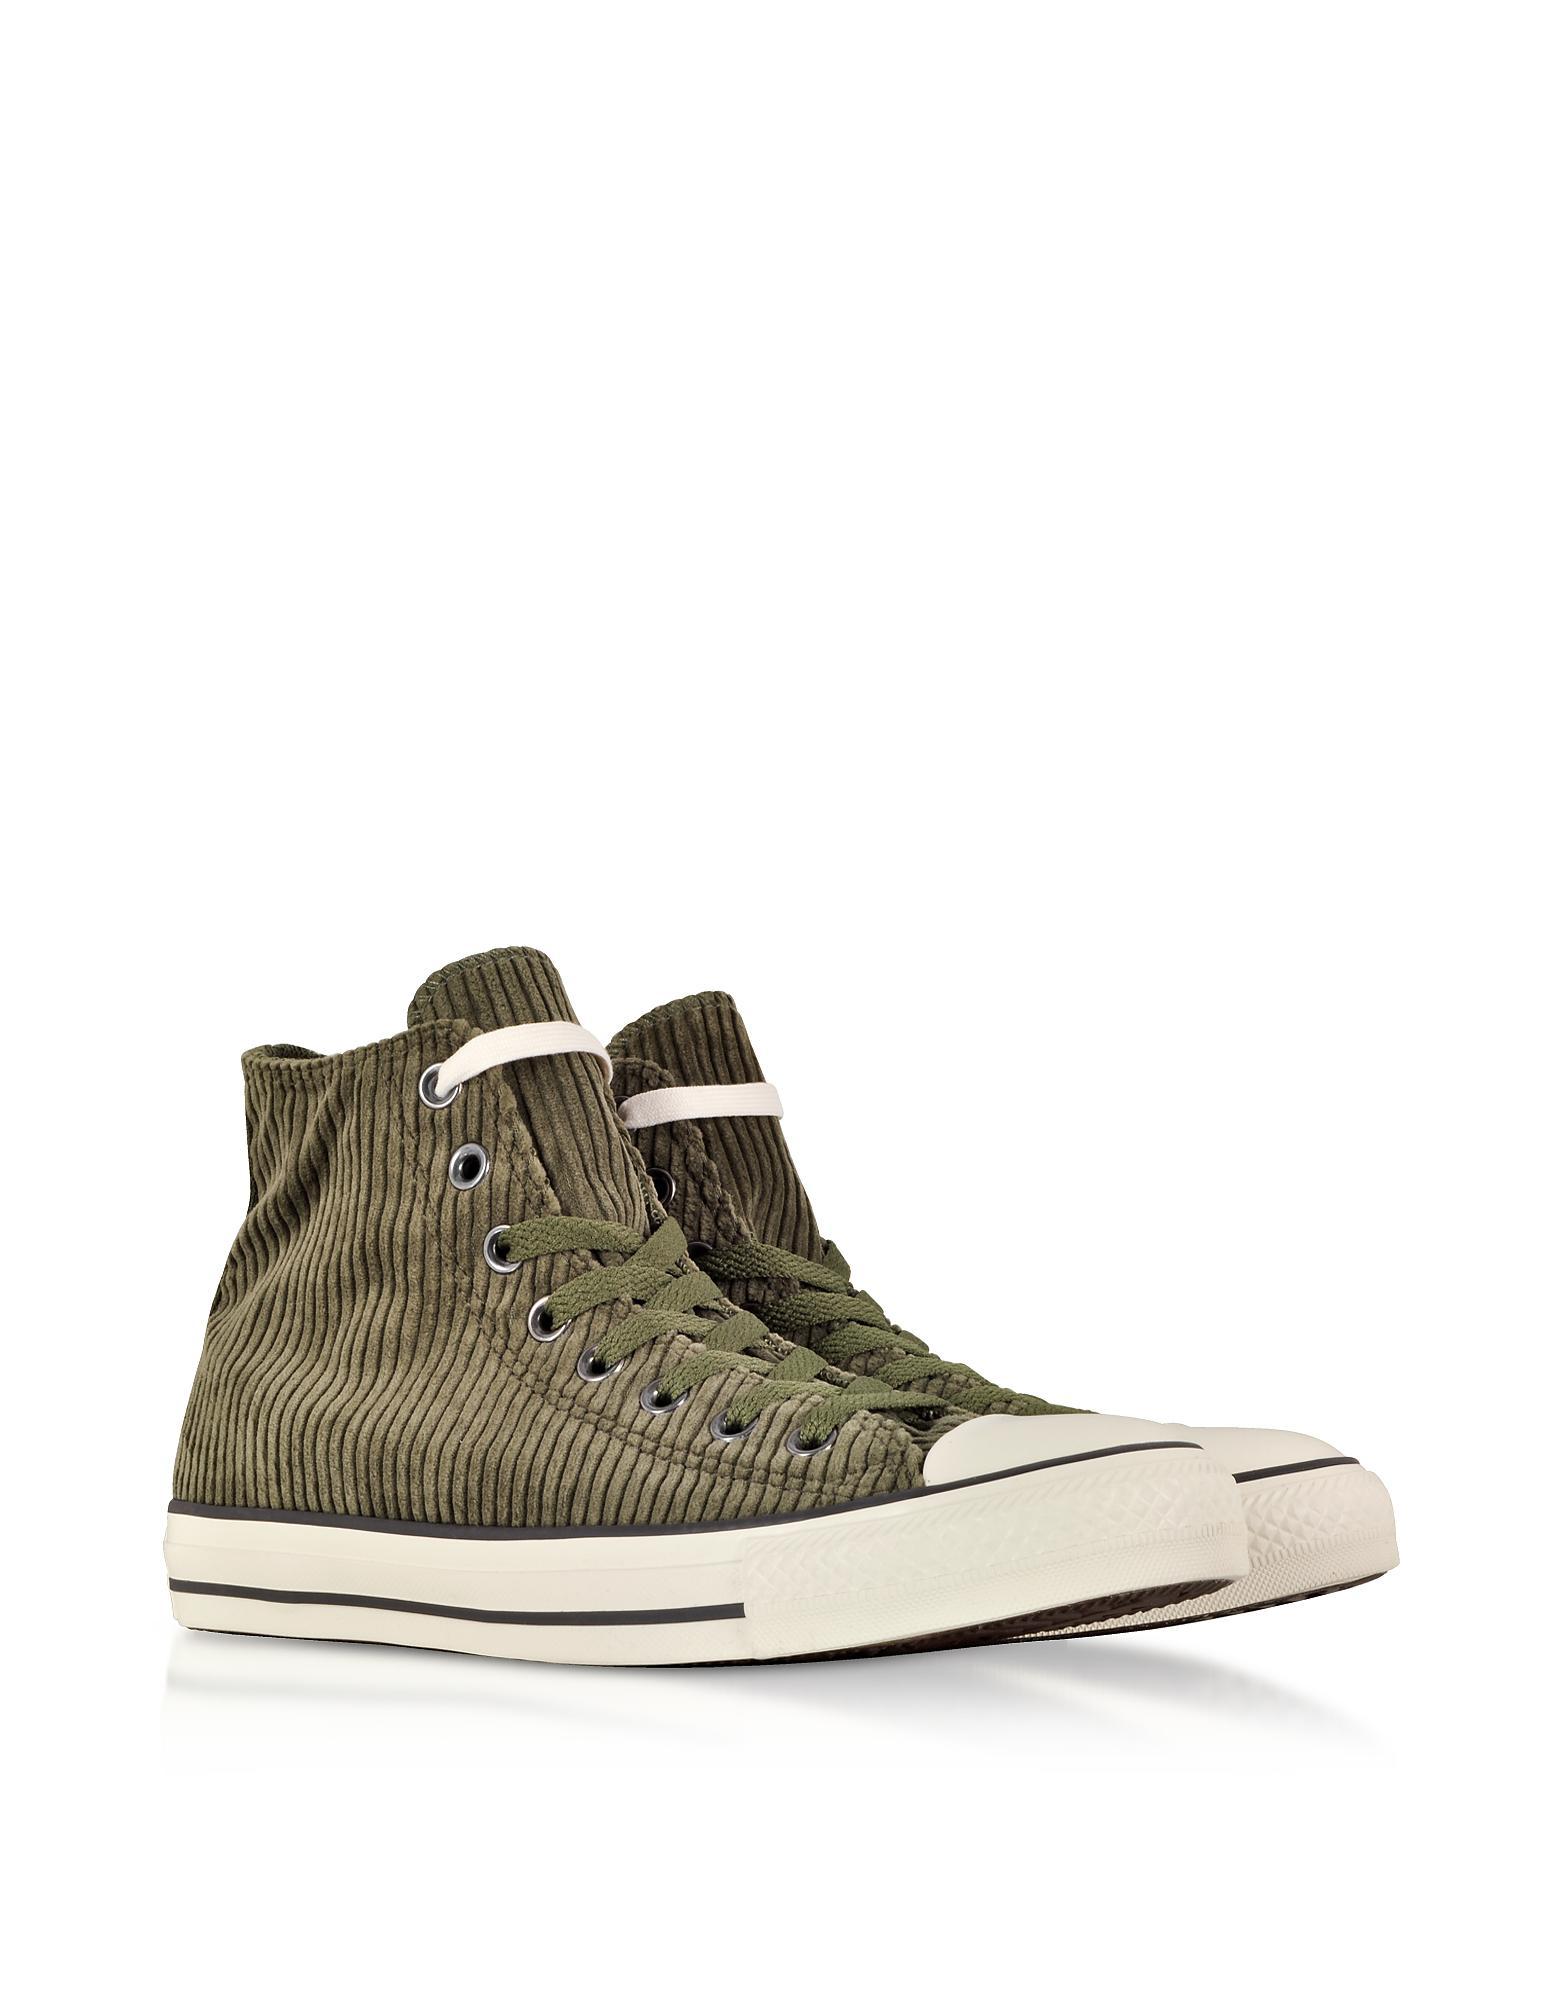 9a87759d4f3d1d Lyst - Converse Chuck Taylor All Star Hi Military Green Corduroy ...